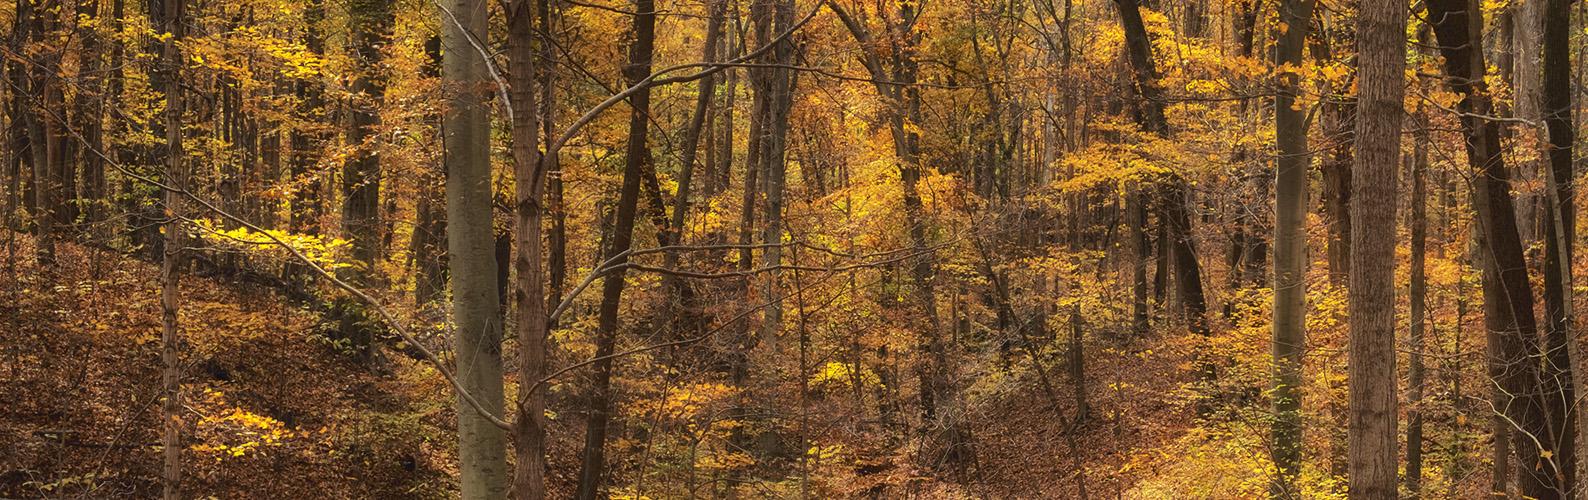 harmonie-state-park-fall-ravine